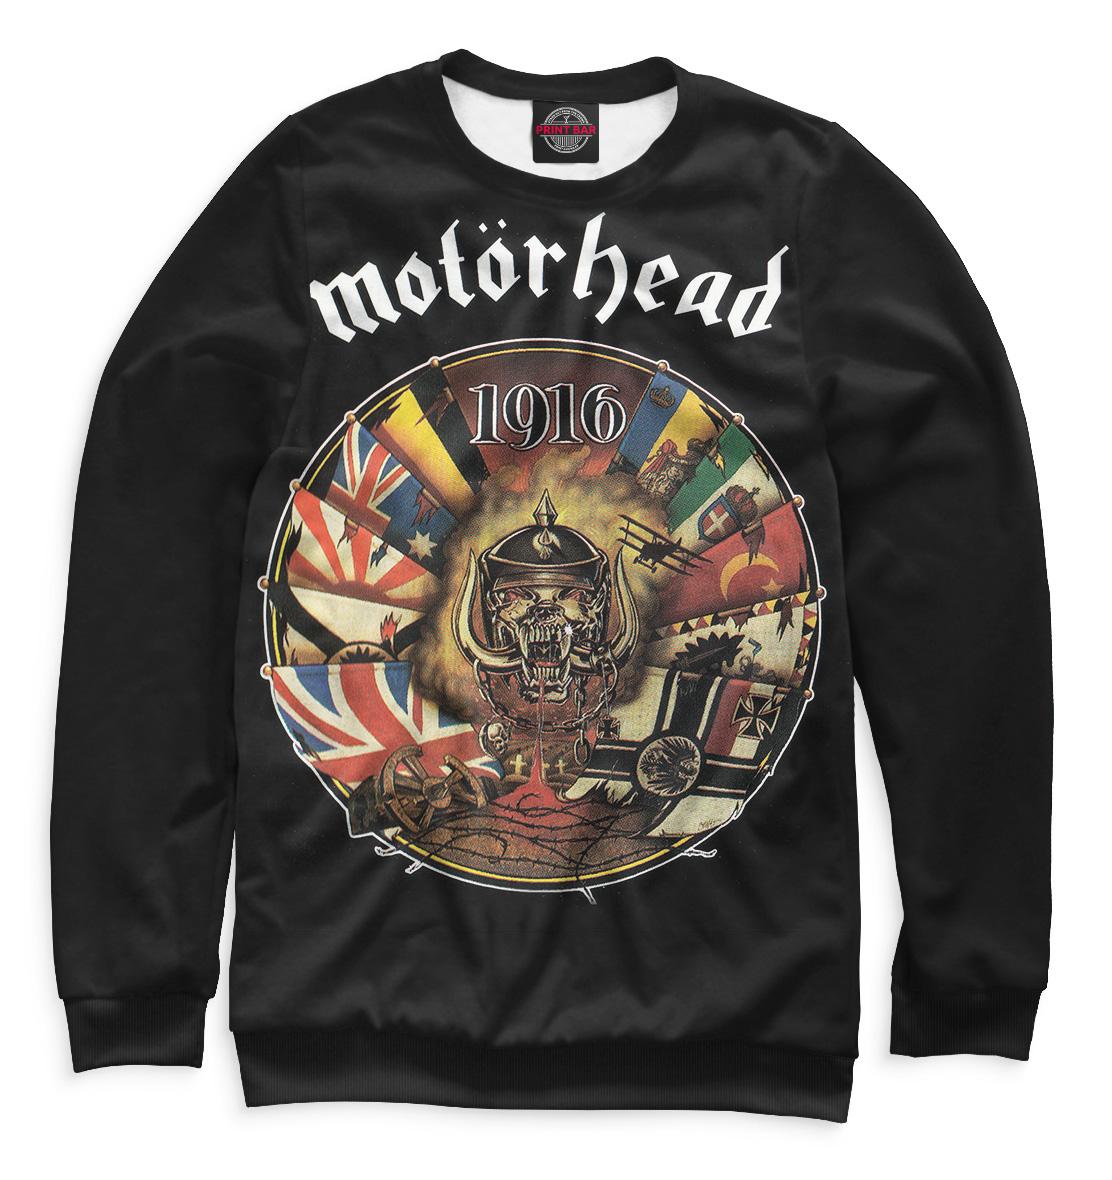 Купить Motorhead, Printbar, Свитшоты, MOT-585580-swi-2